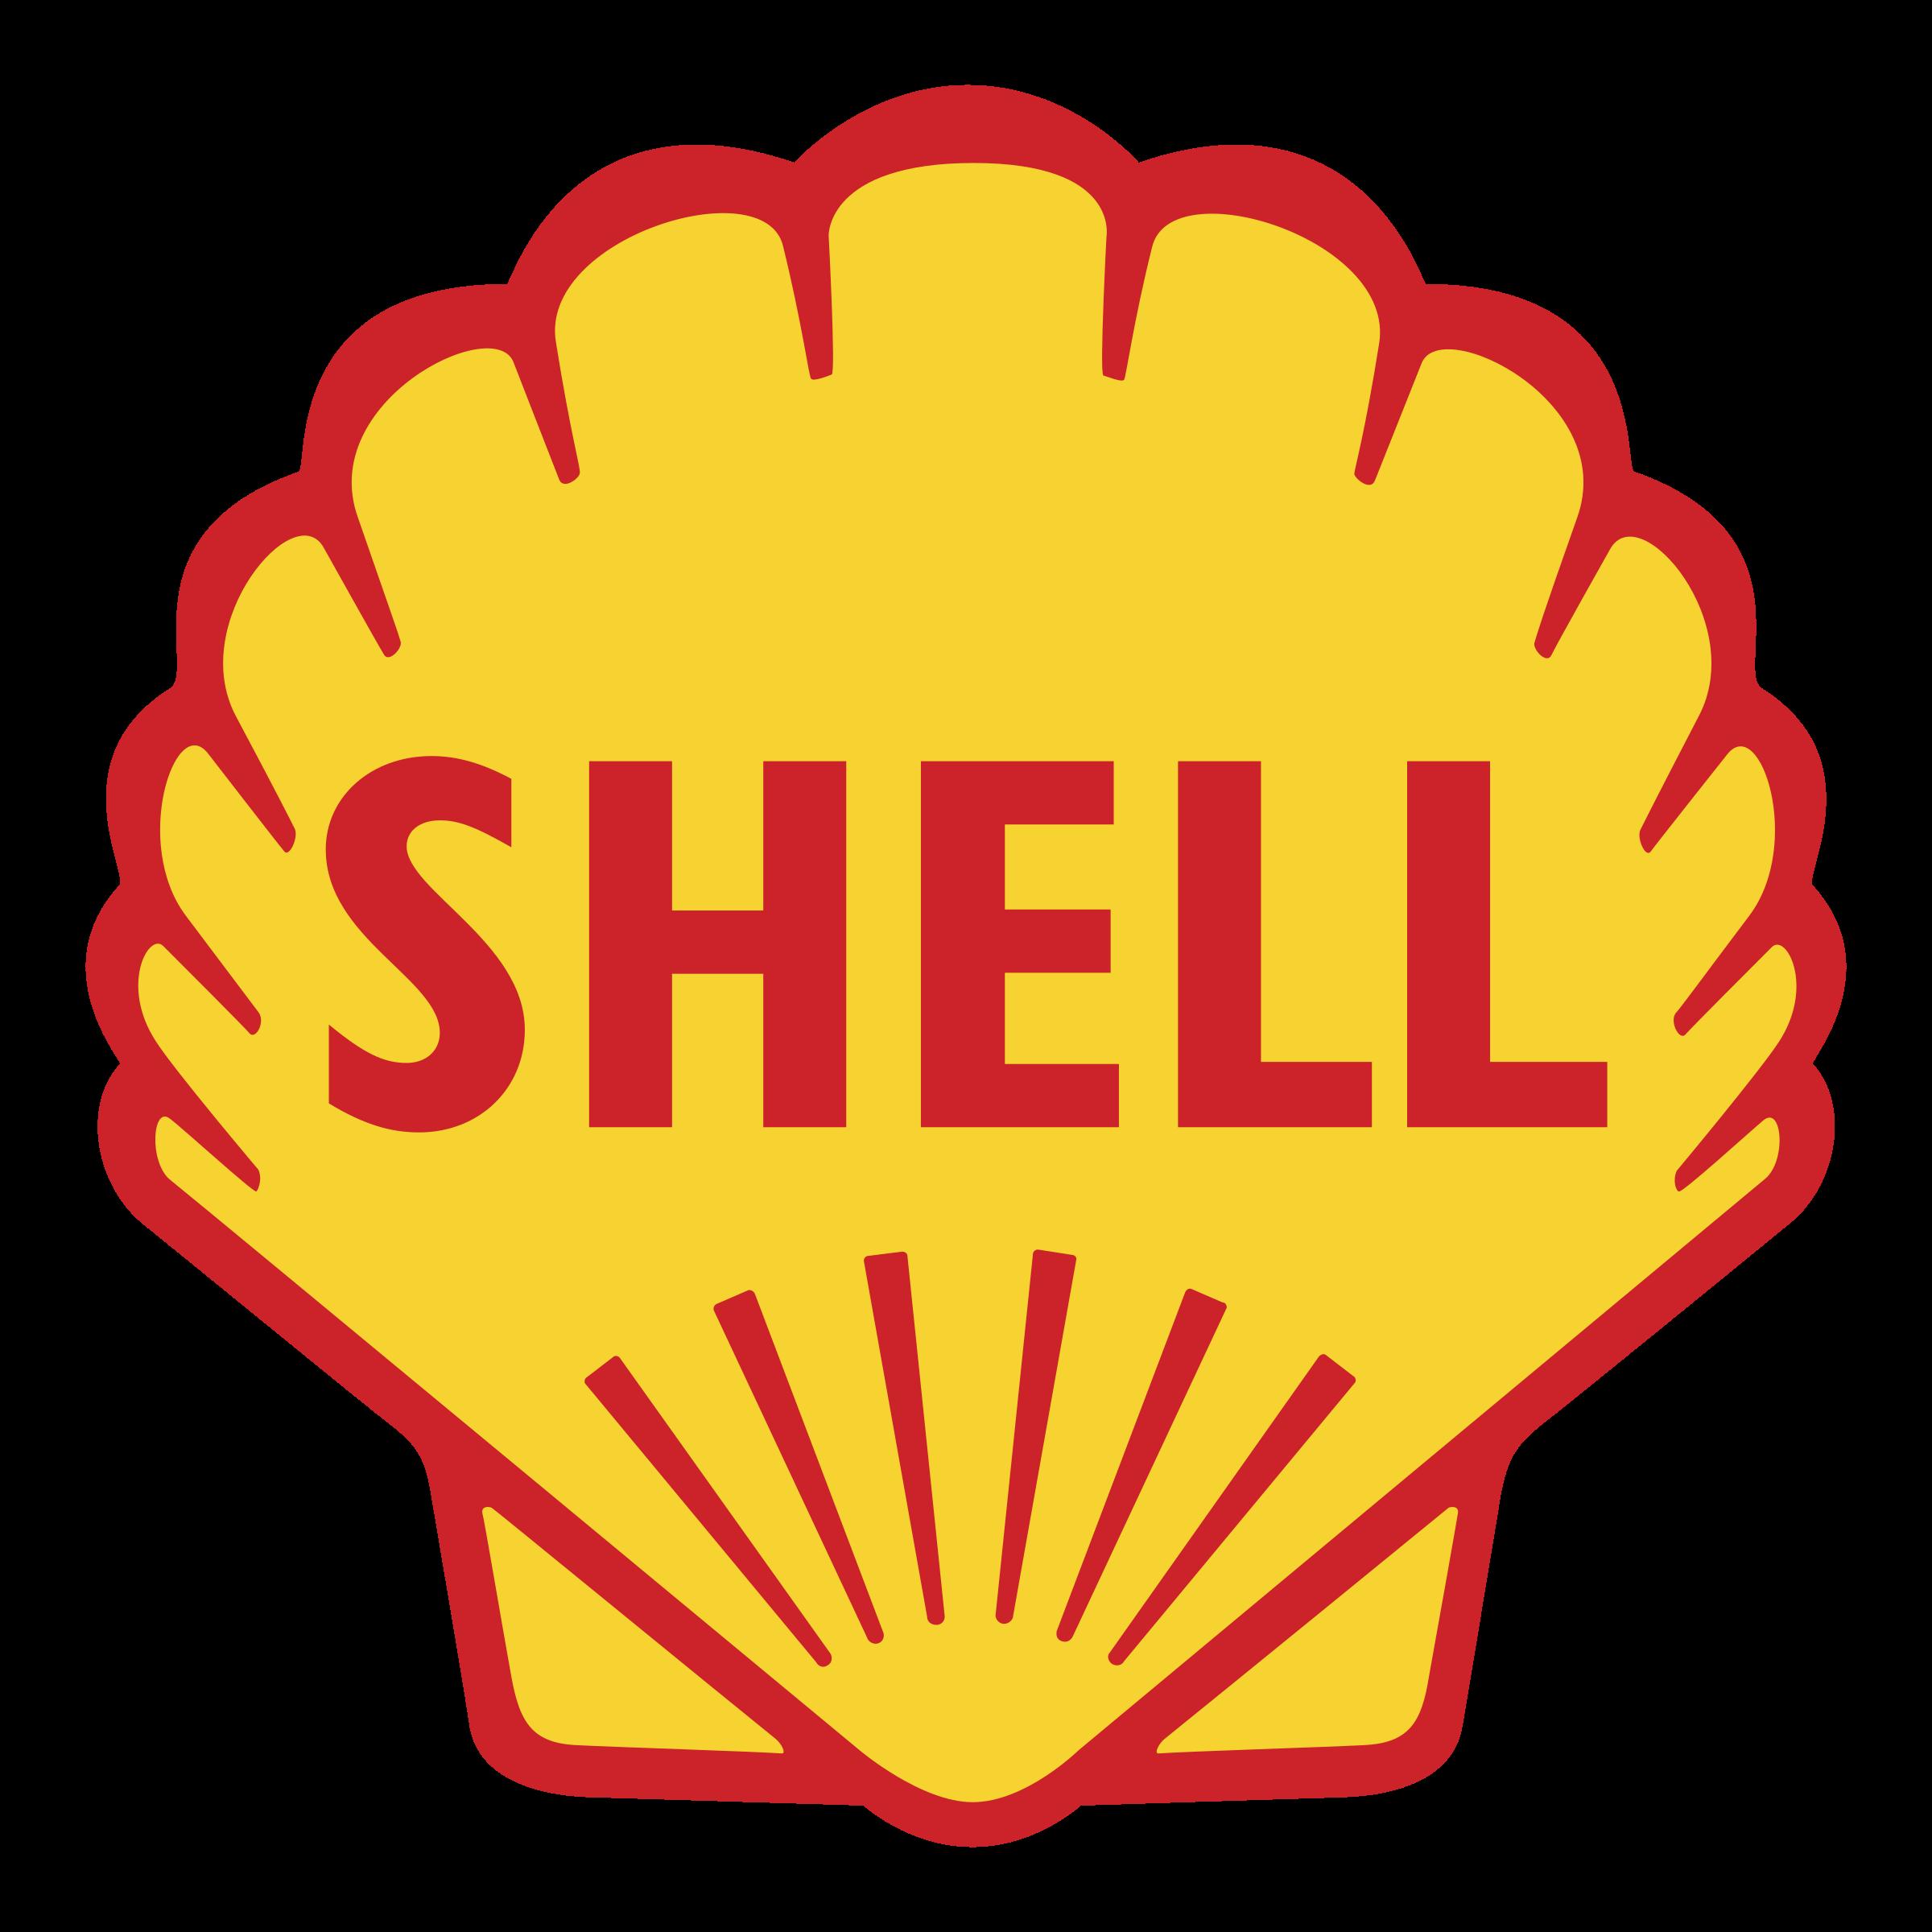 shell logo png transparent svg vector freebie supply rh freebiesupply com shell helix logo vector shell logo vector cdr